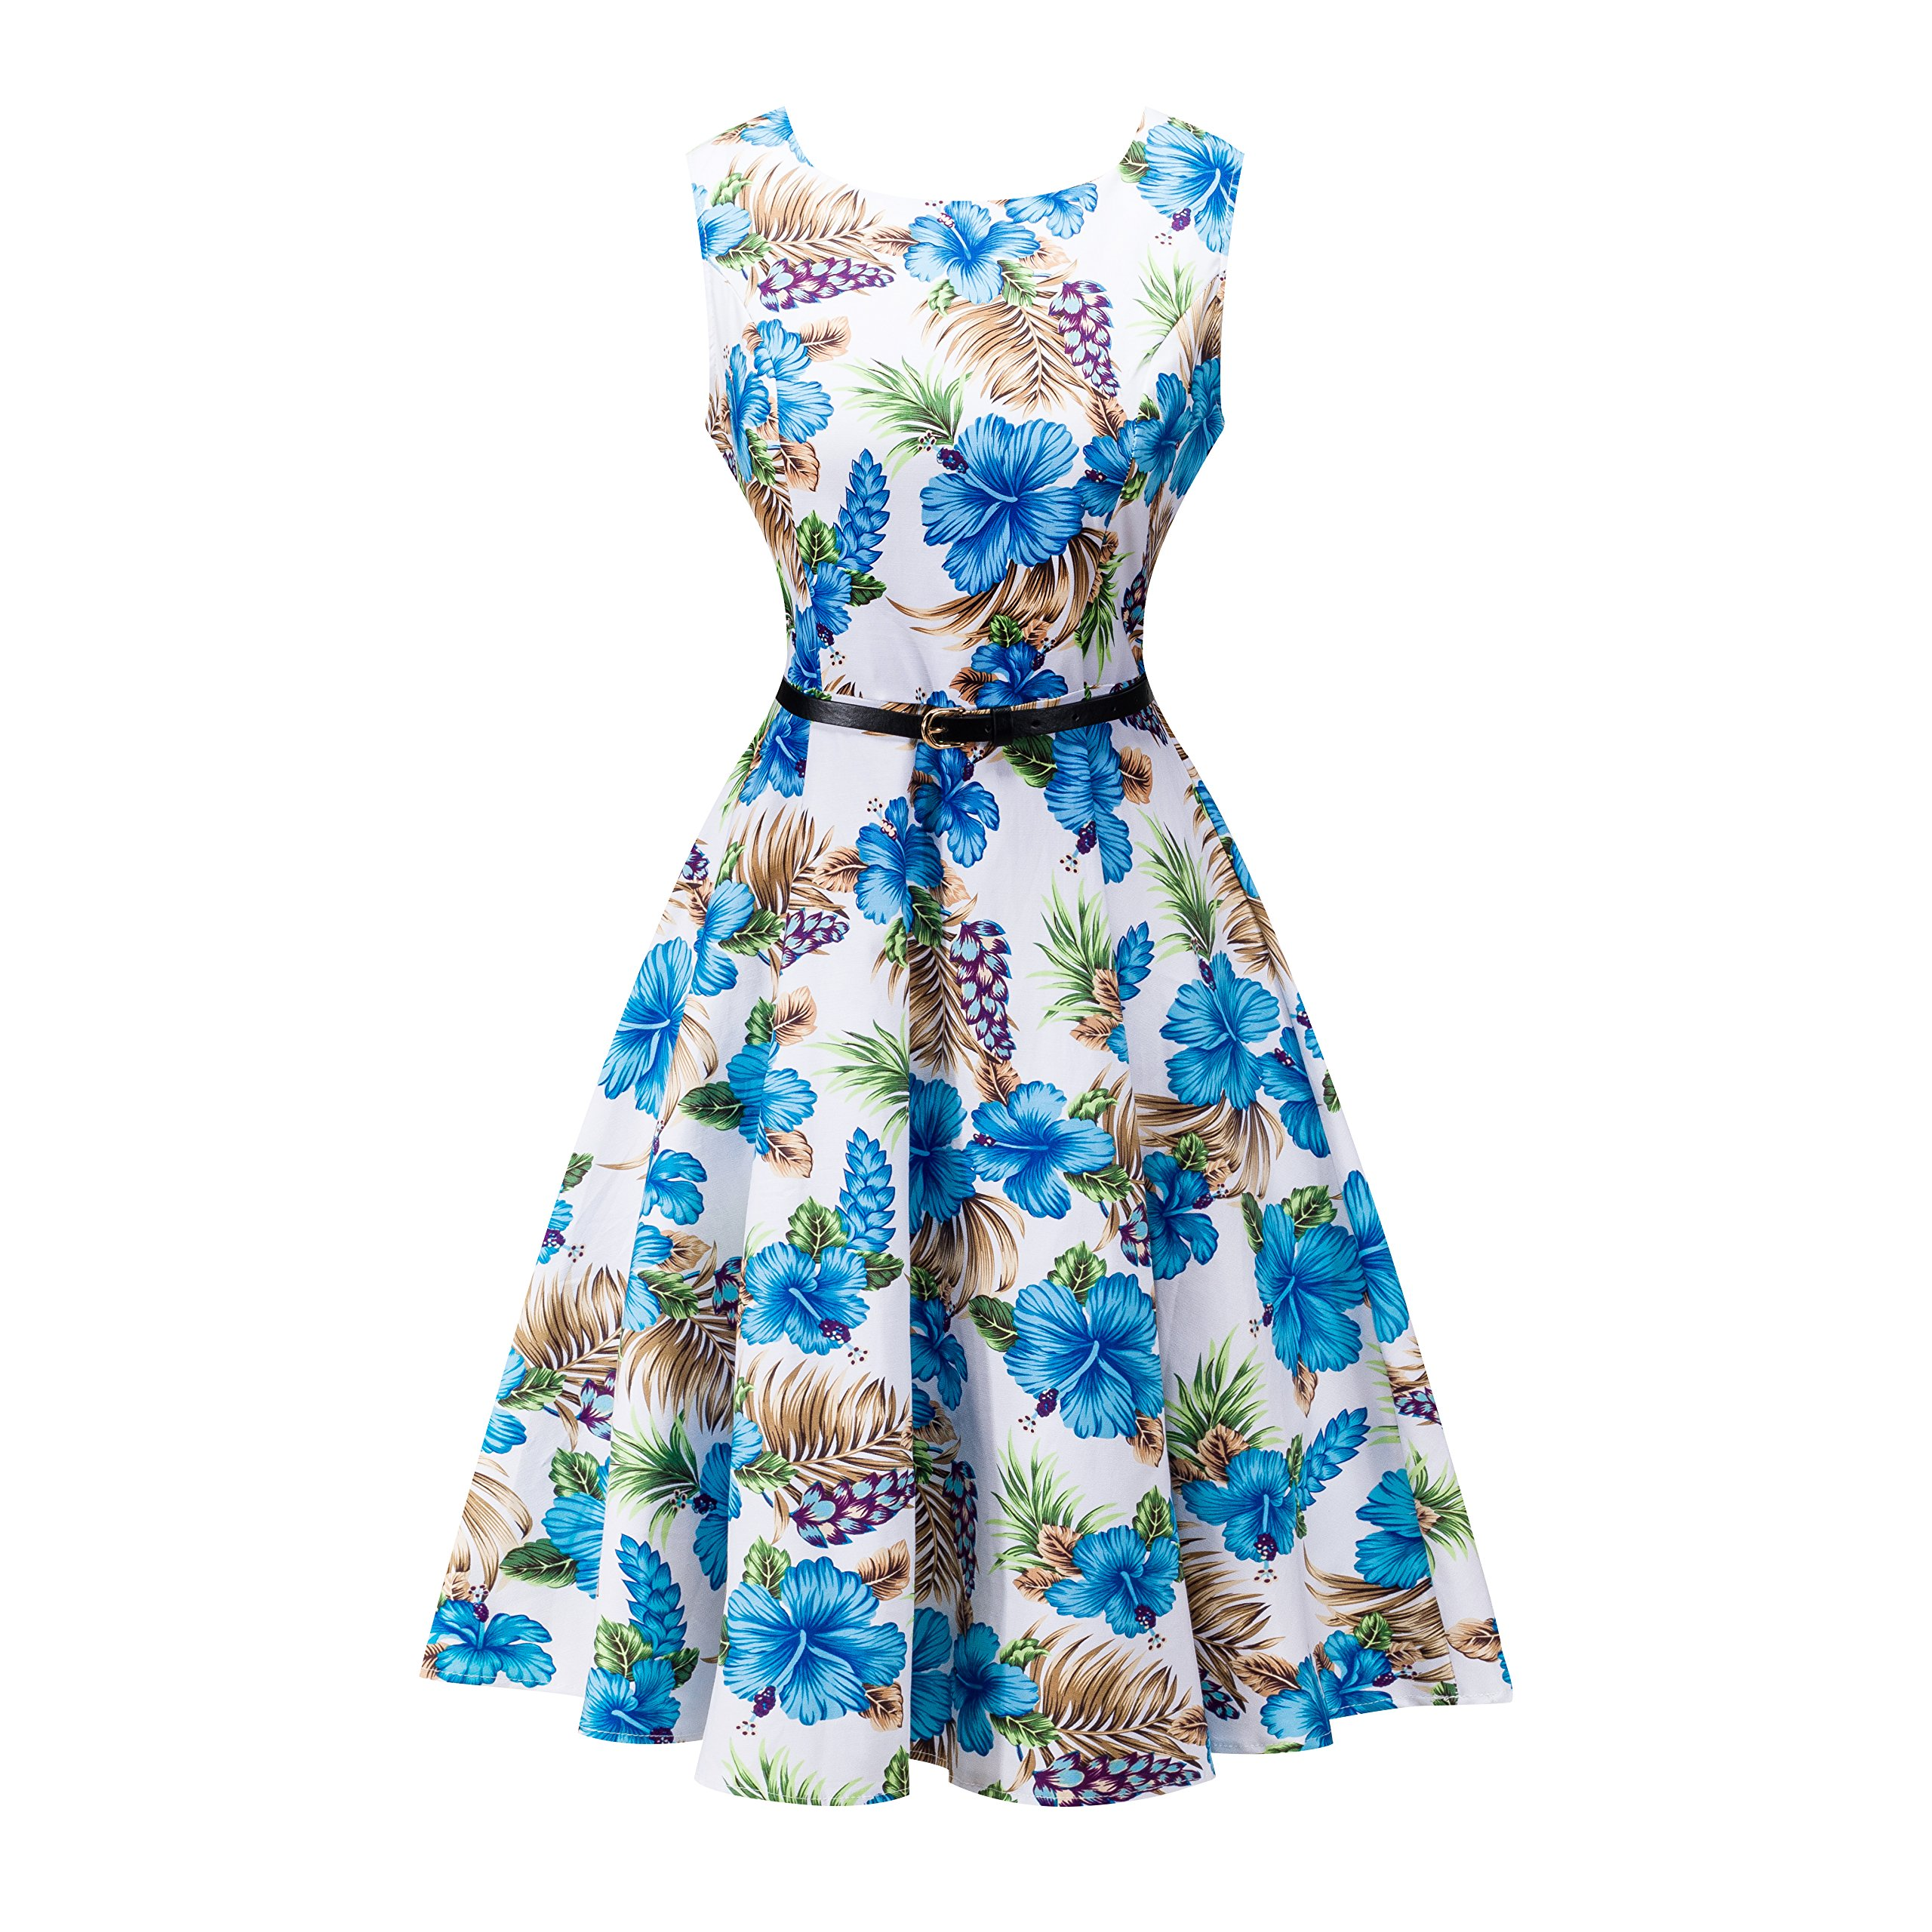 Available at Amazon: Yeokou Women's Sleeveless Floral Knee Length Cotton Hawaiian Flare Luau Tank Dress